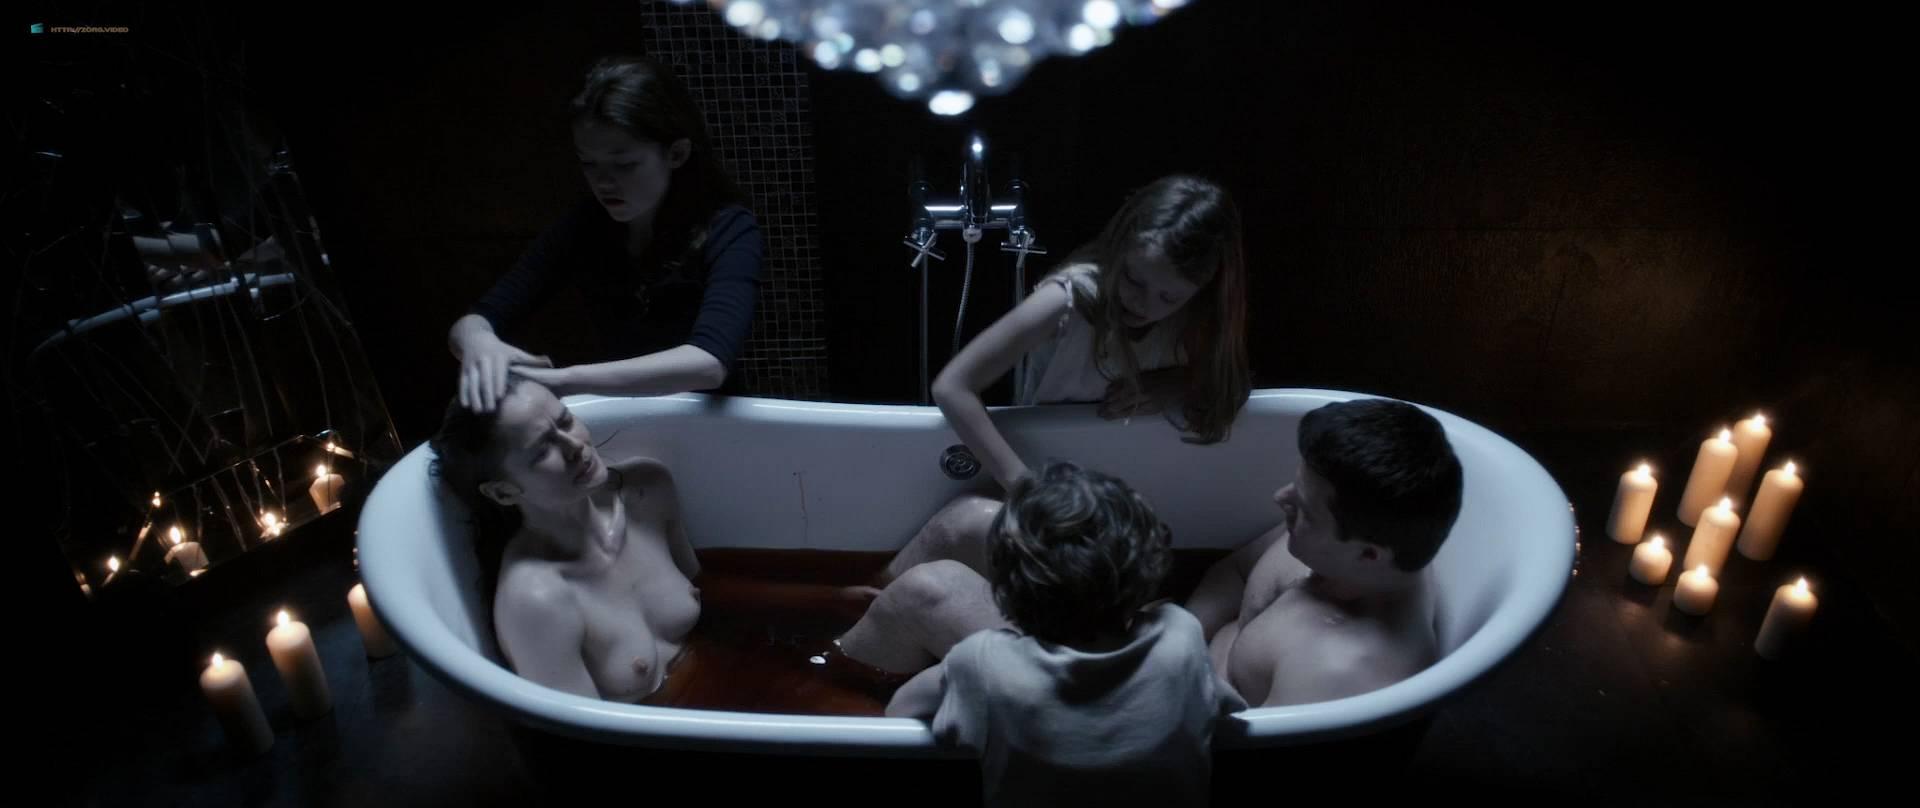 Marcella Plunkett nude topless in bath - Dark Touch (2013) HD 1080p BluRay (6)